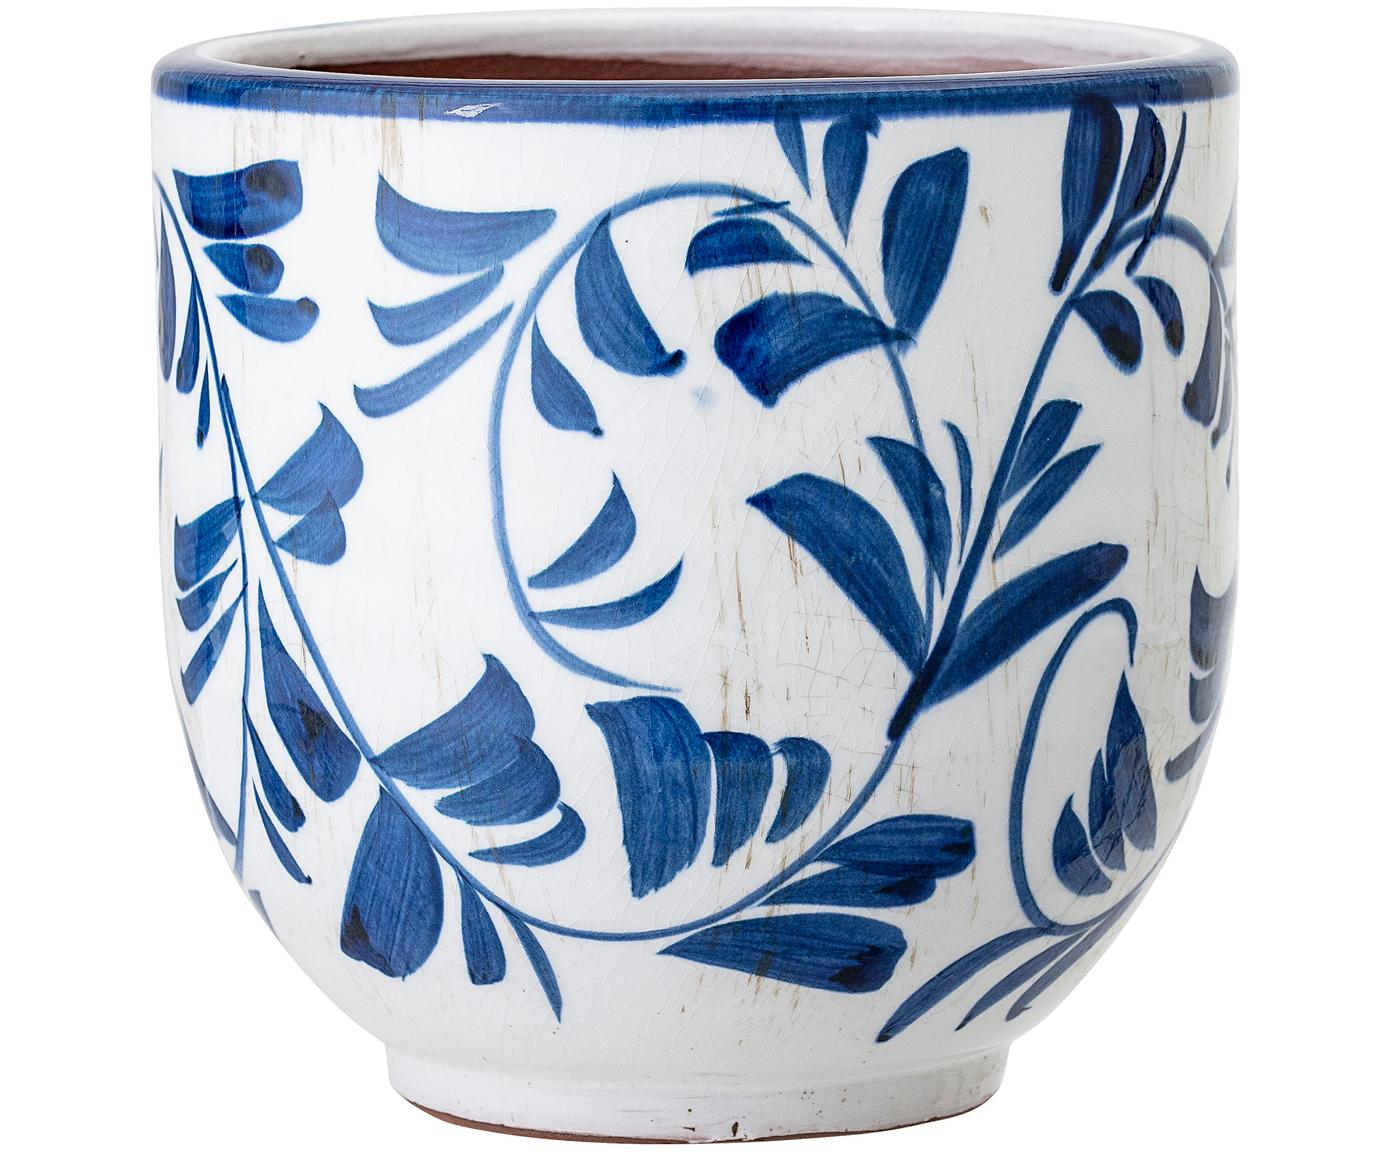 Übertopf Jarl, Terracotta, Blau, Weiss, Ø 14 x H 14 cm